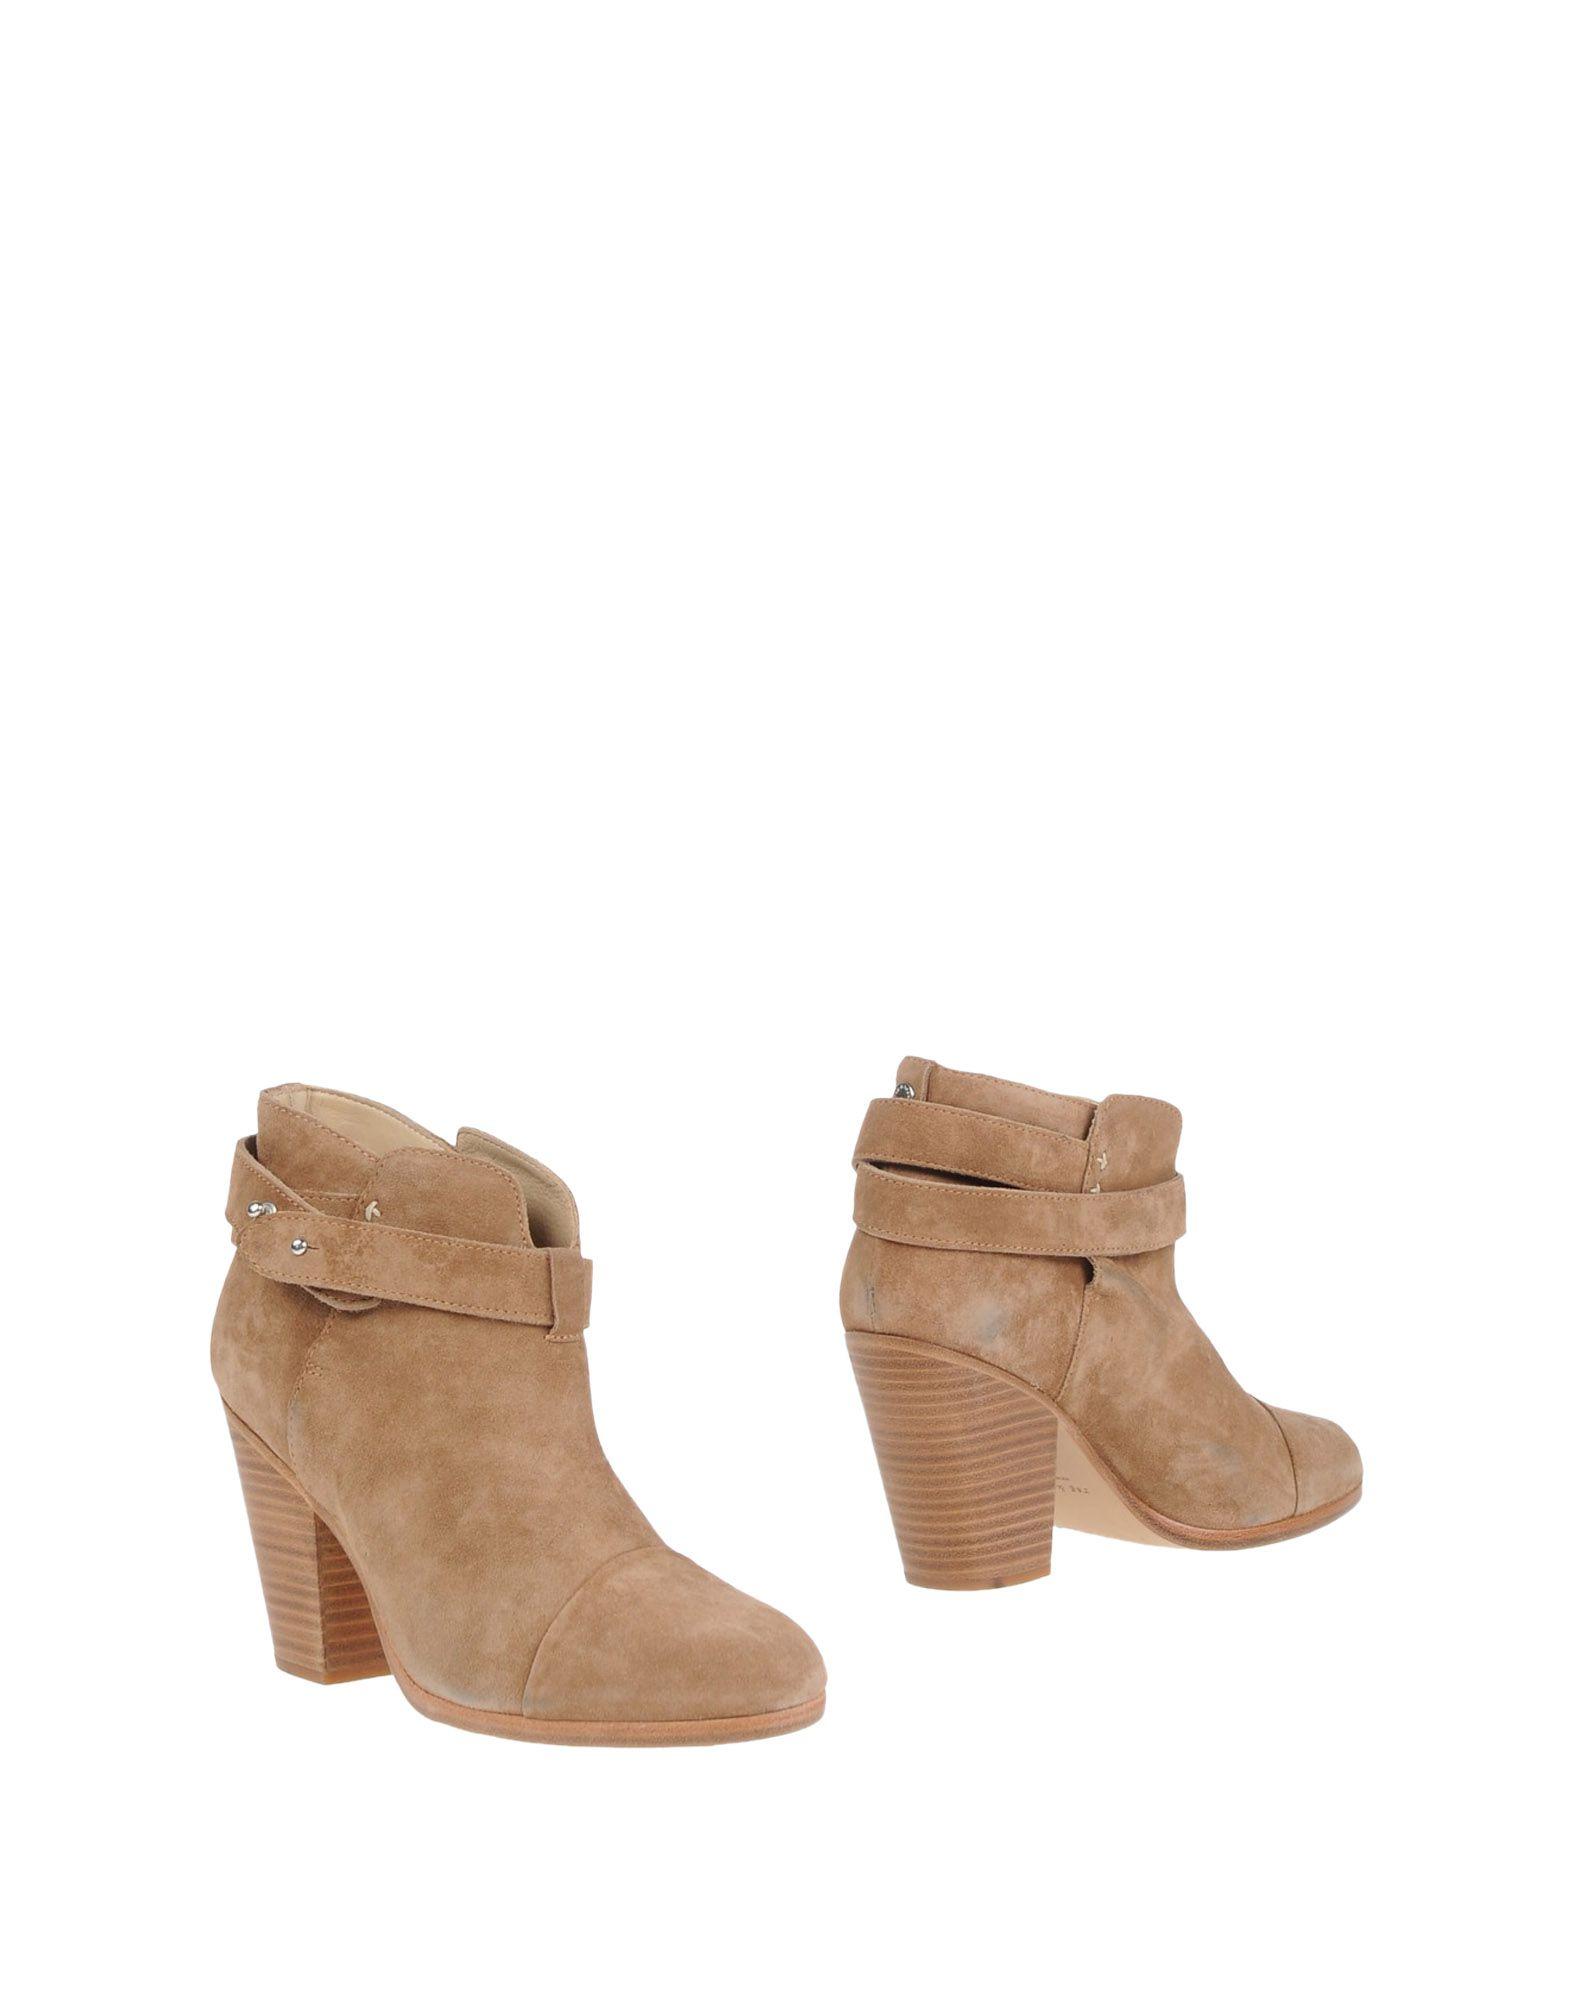 Rabatt Stiefelette Schuhe Rag & Bone Stiefelette Rabatt Damen  11132411NX 7bcfa5